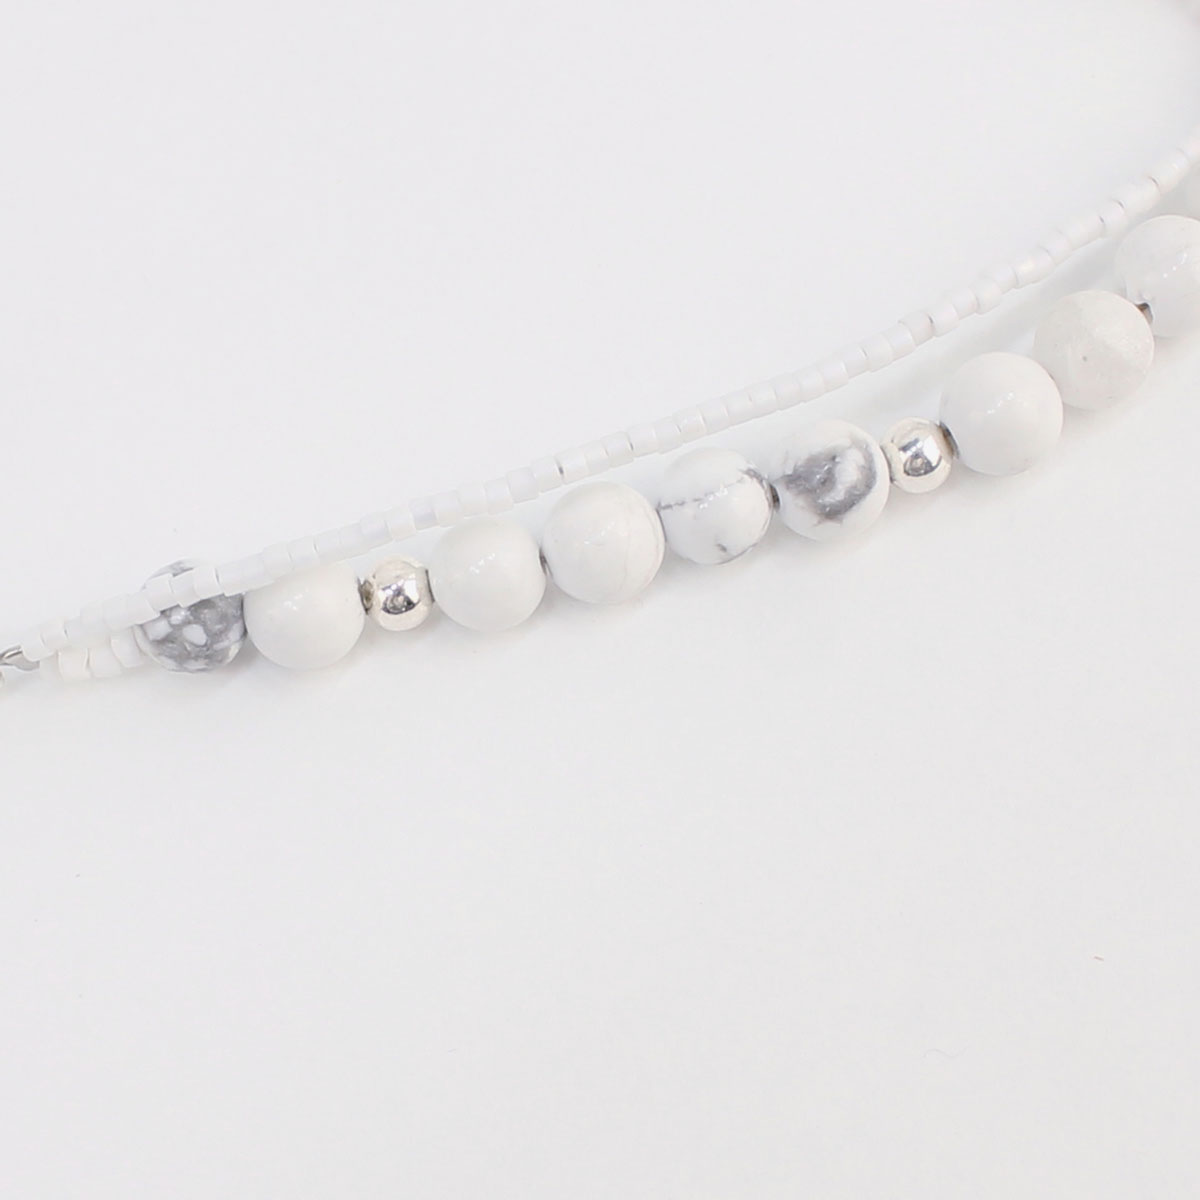 POLPETTA ポルペッタ ハウライト シルバー925 2連ブレスレット STONE BRACELET 001 WHITE-POL (ホワイト)